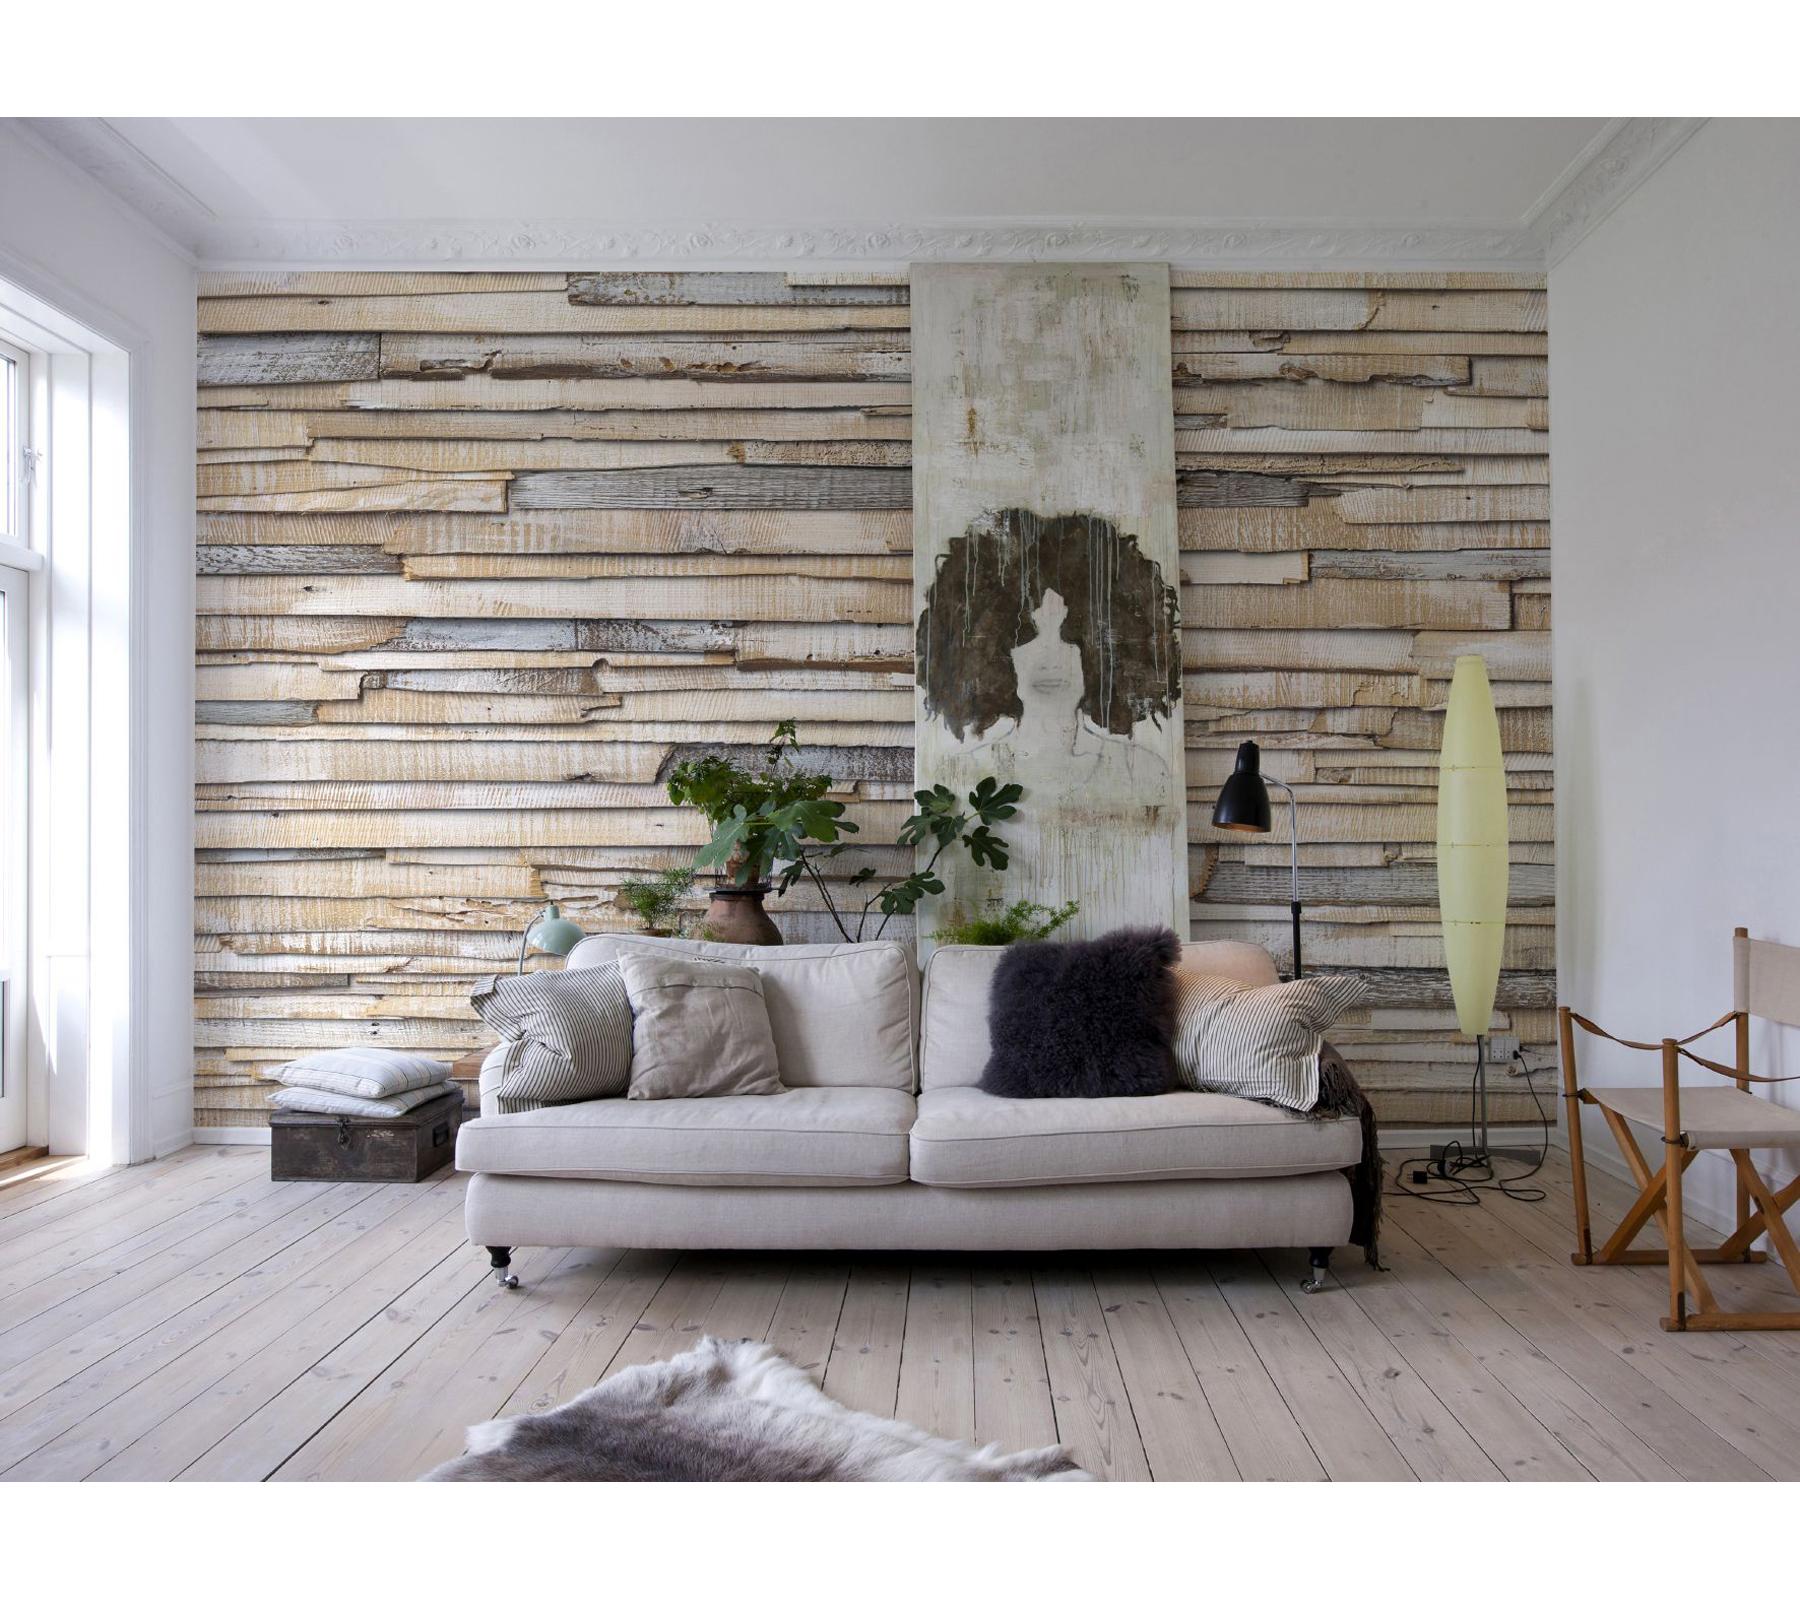 Komar Whitewashed Wood Wall Mural